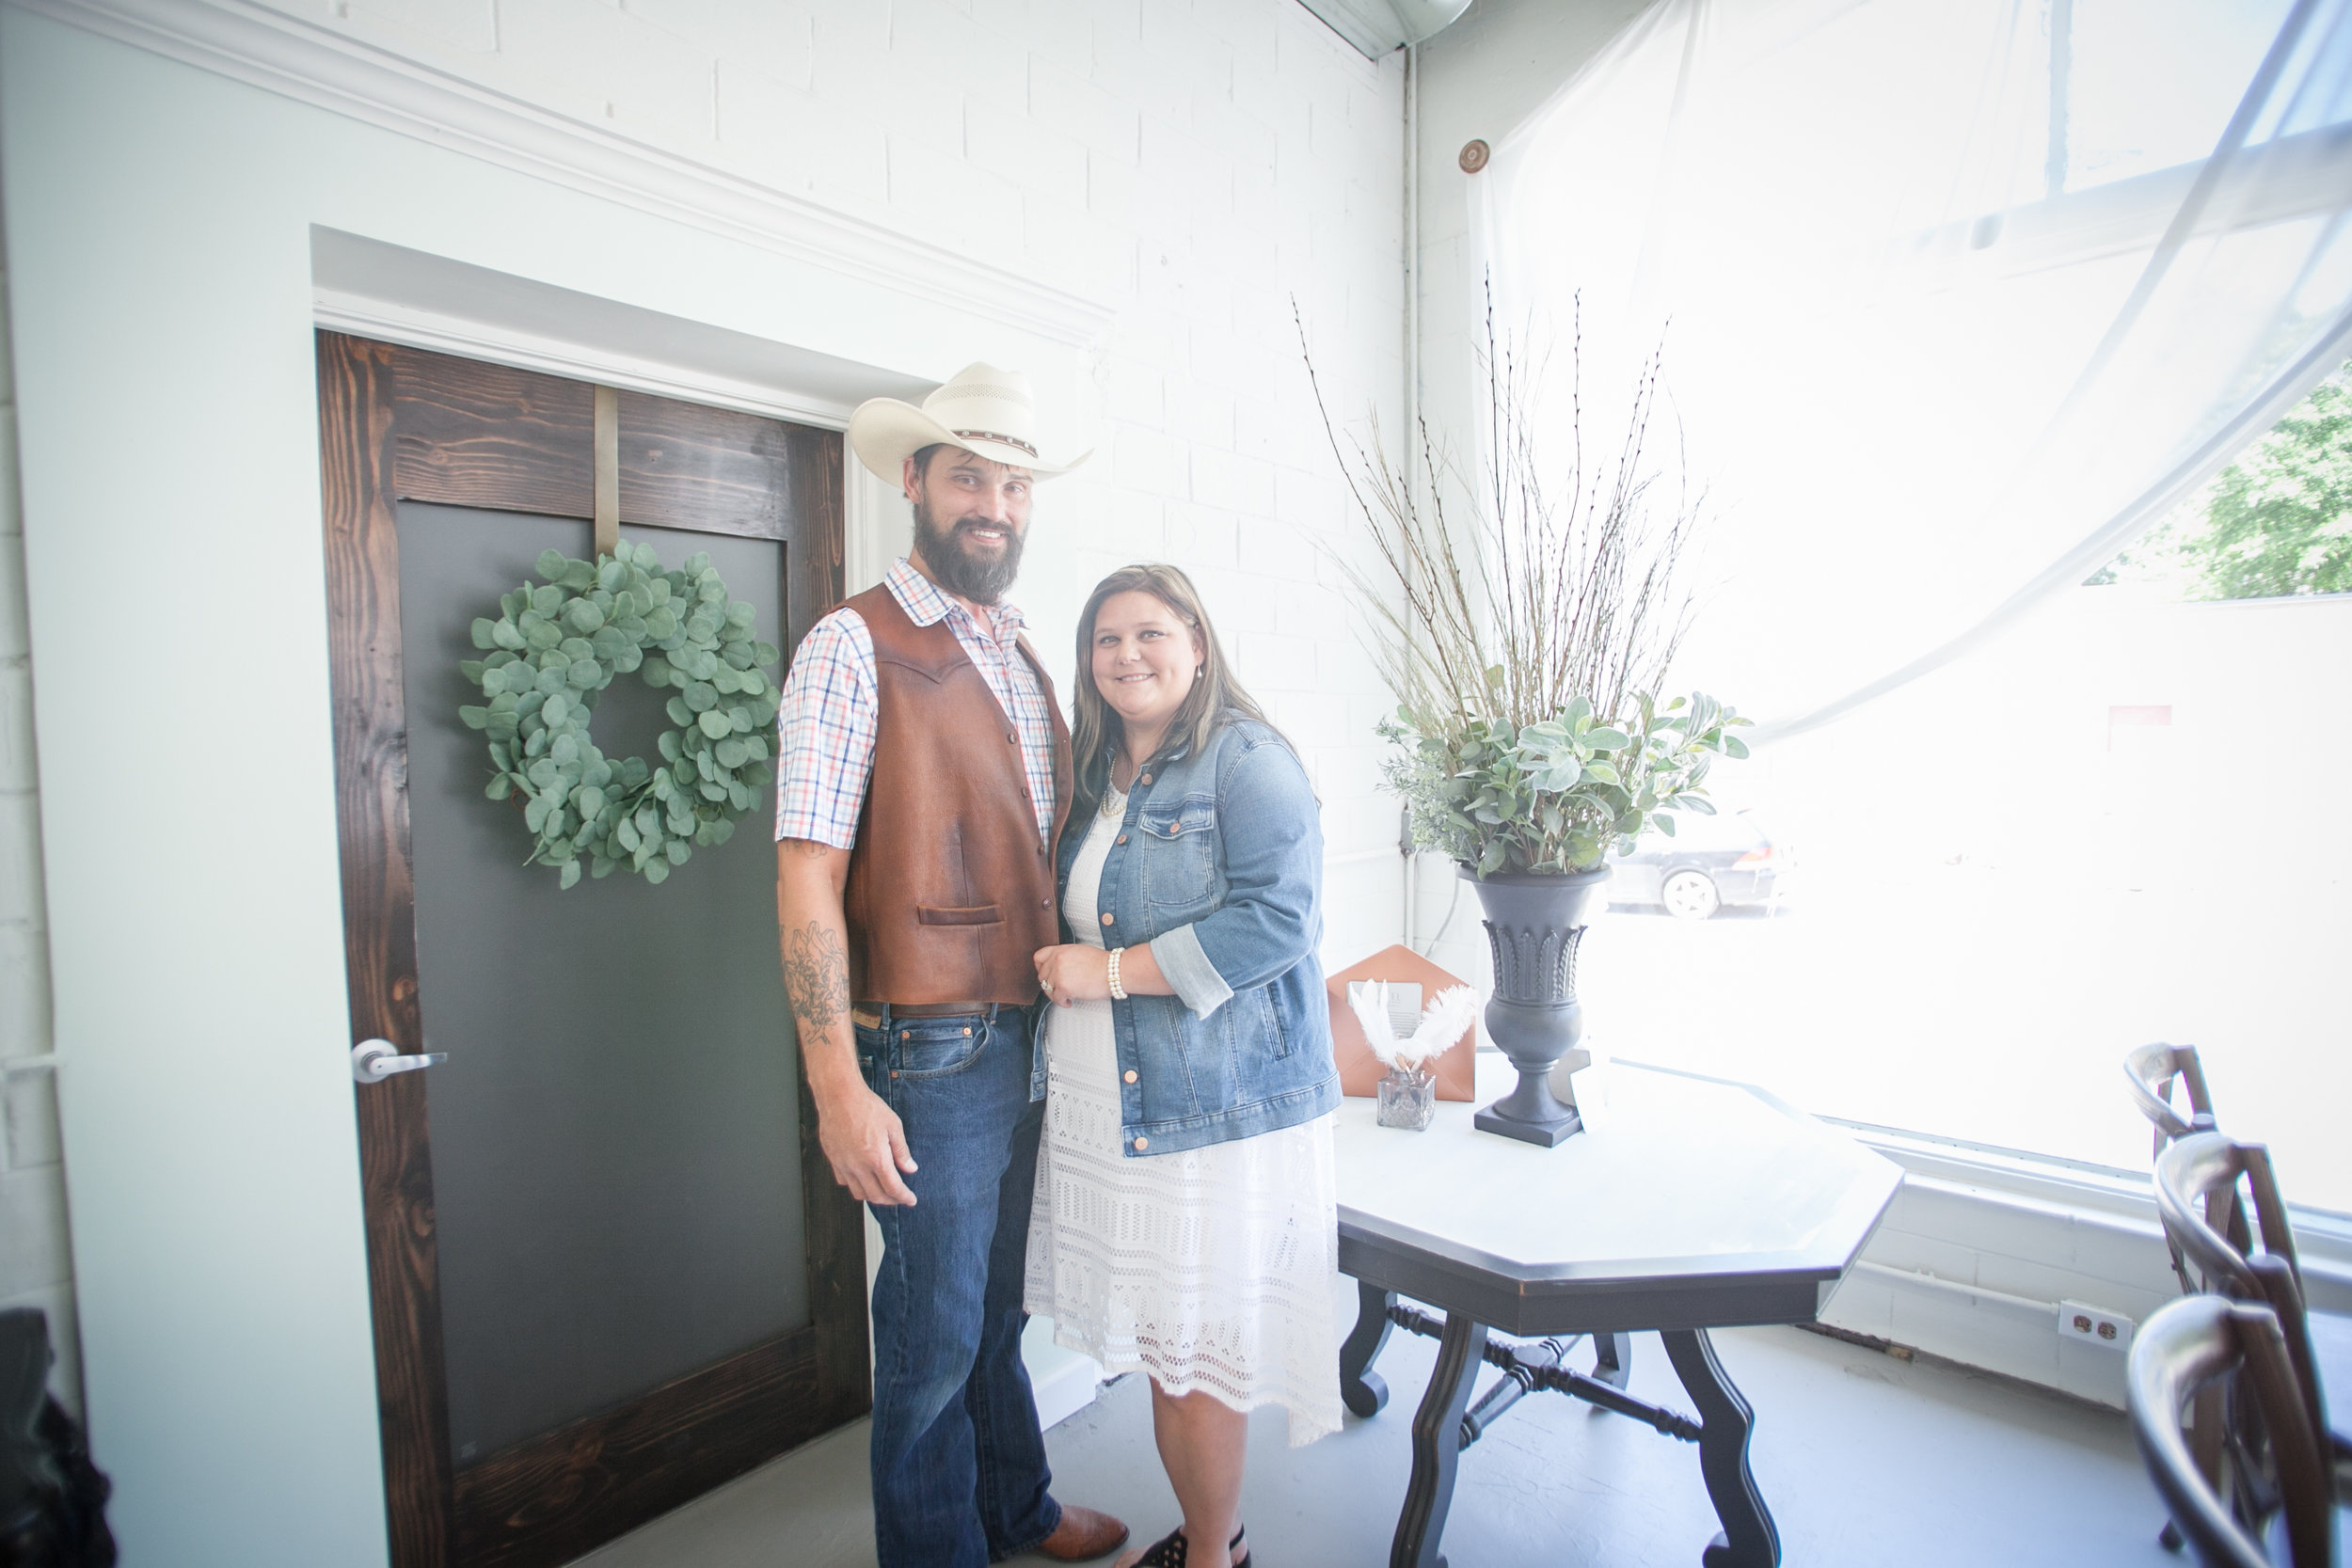 Kansas_City_Small_Wedding_Venue_Elope_Intimate_Ceremony_Budget_Affordable_Wedding Day-116.jpg